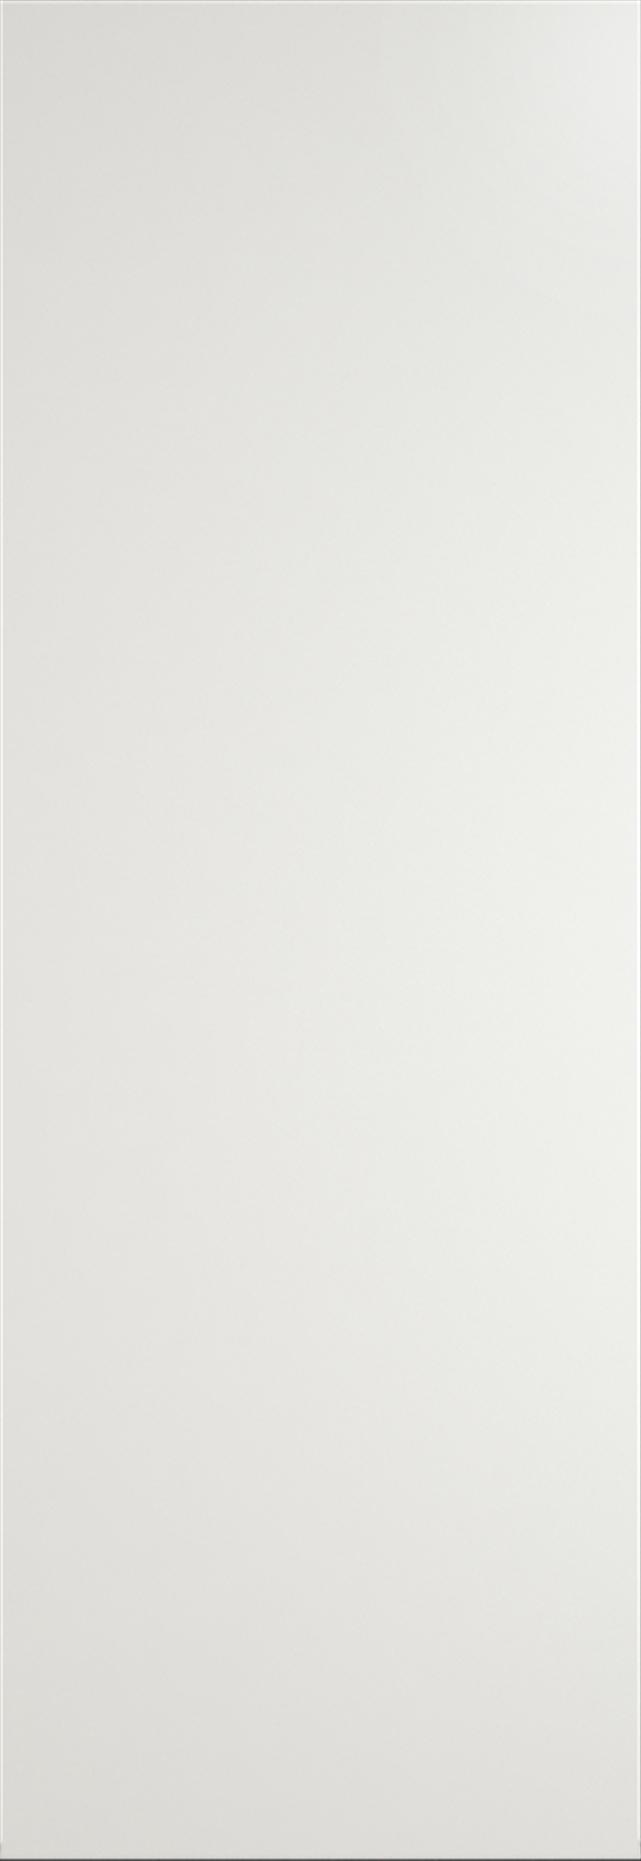 Tivoli А-1 Invisible цвет - Бежевая эмаль Без стекла (ДГ)